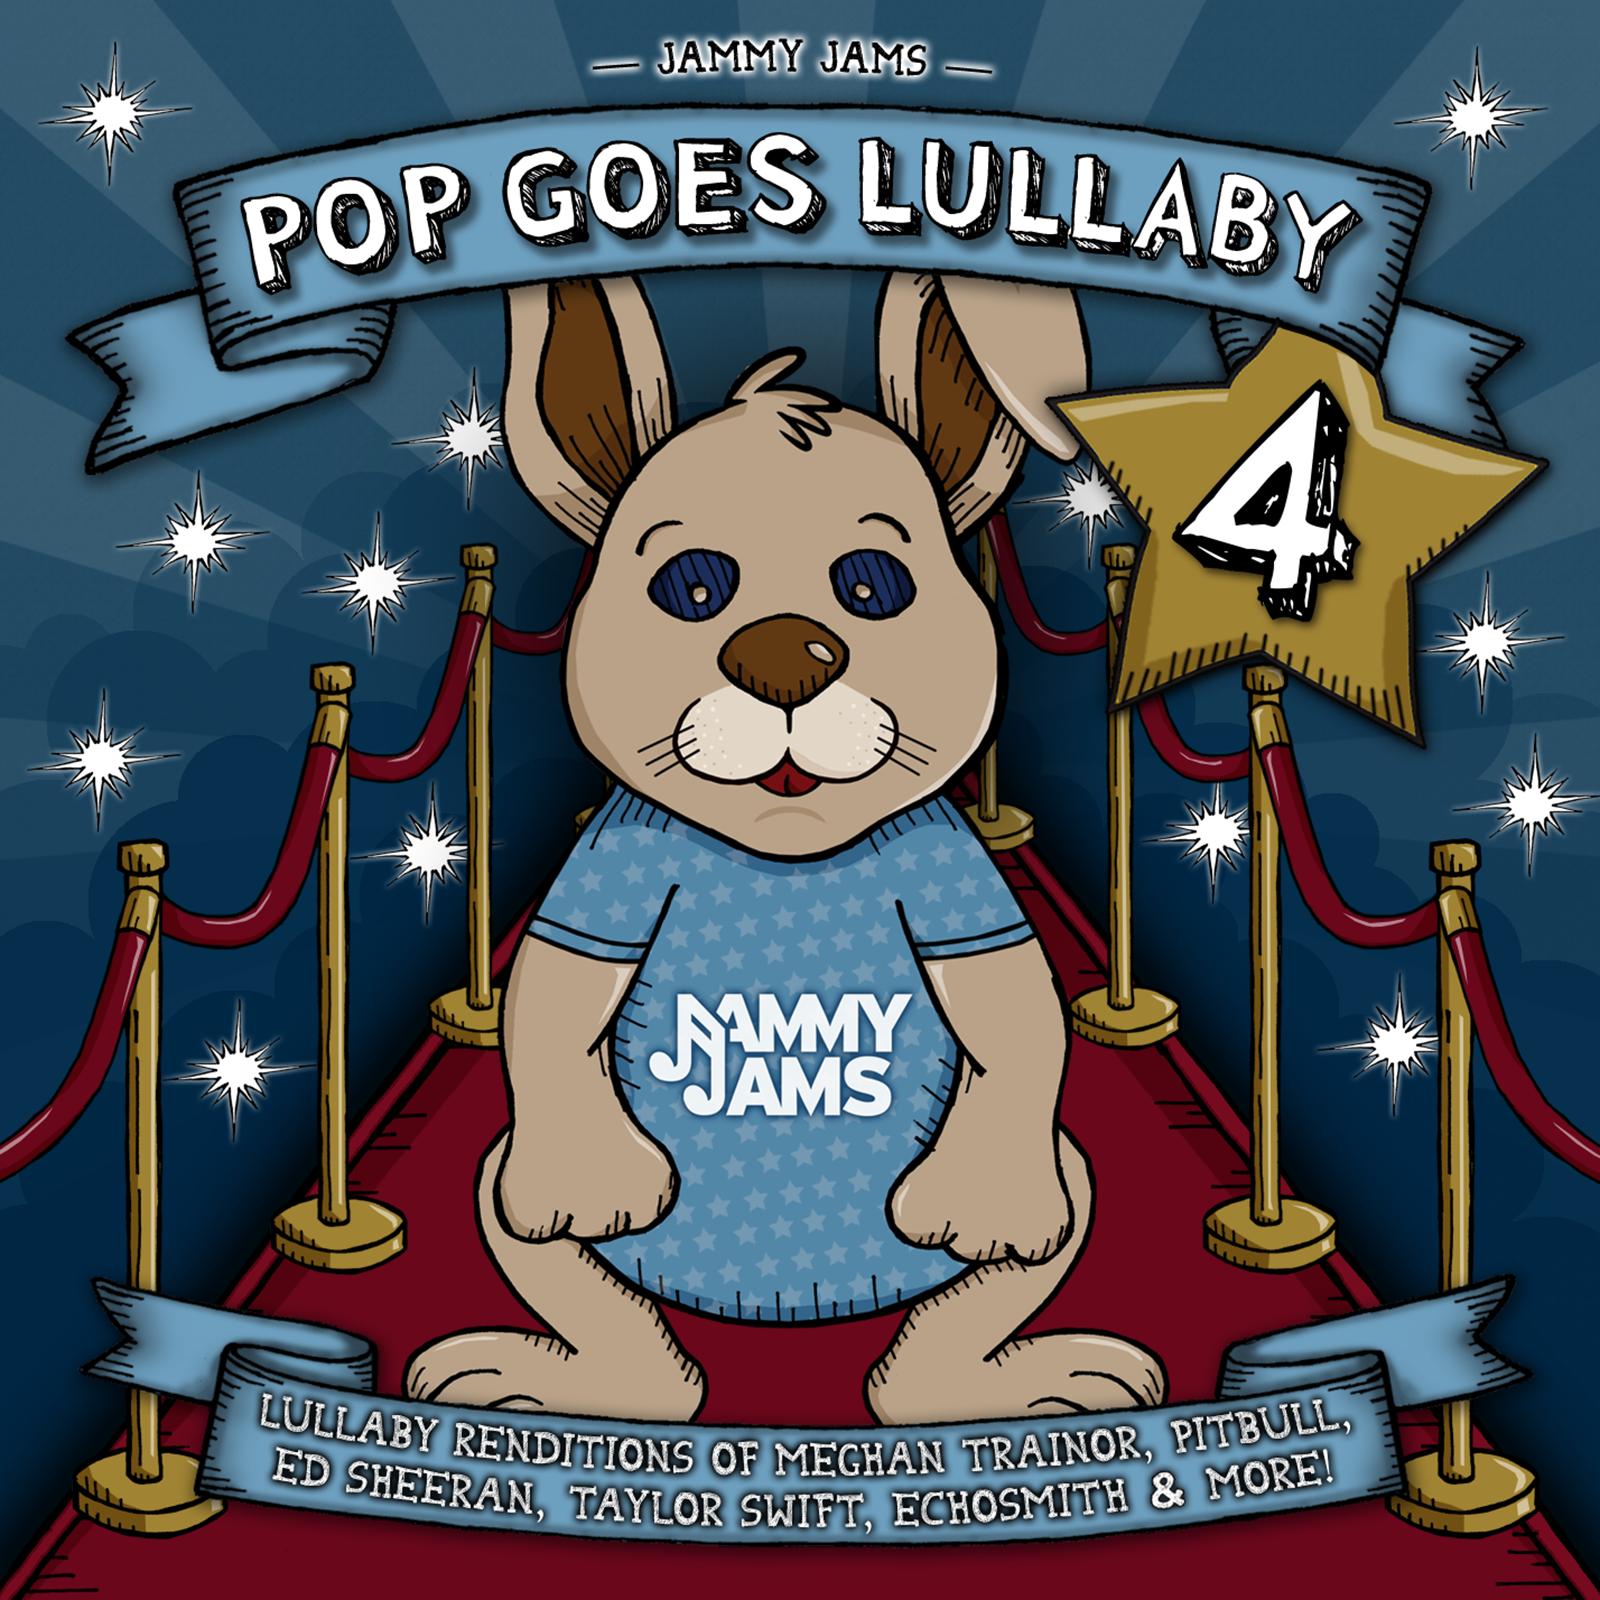 PopGoesLullaby4.jpg